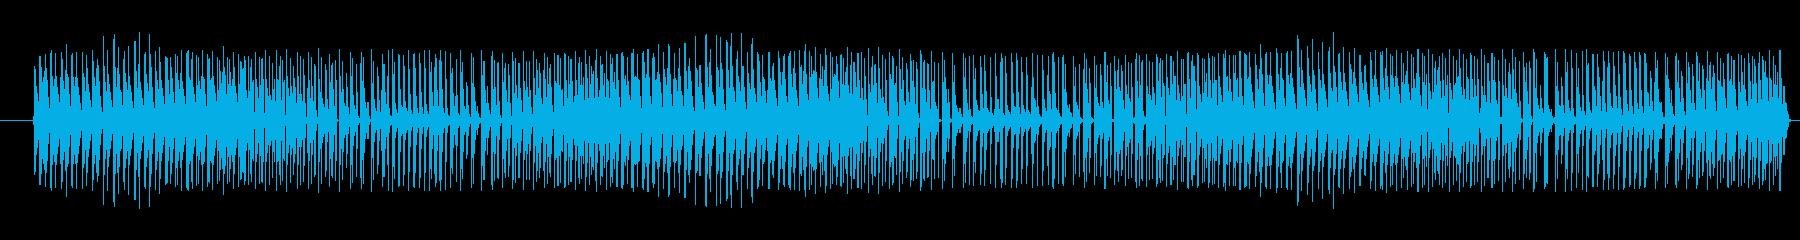 FX 悲観的な戦場01の再生済みの波形